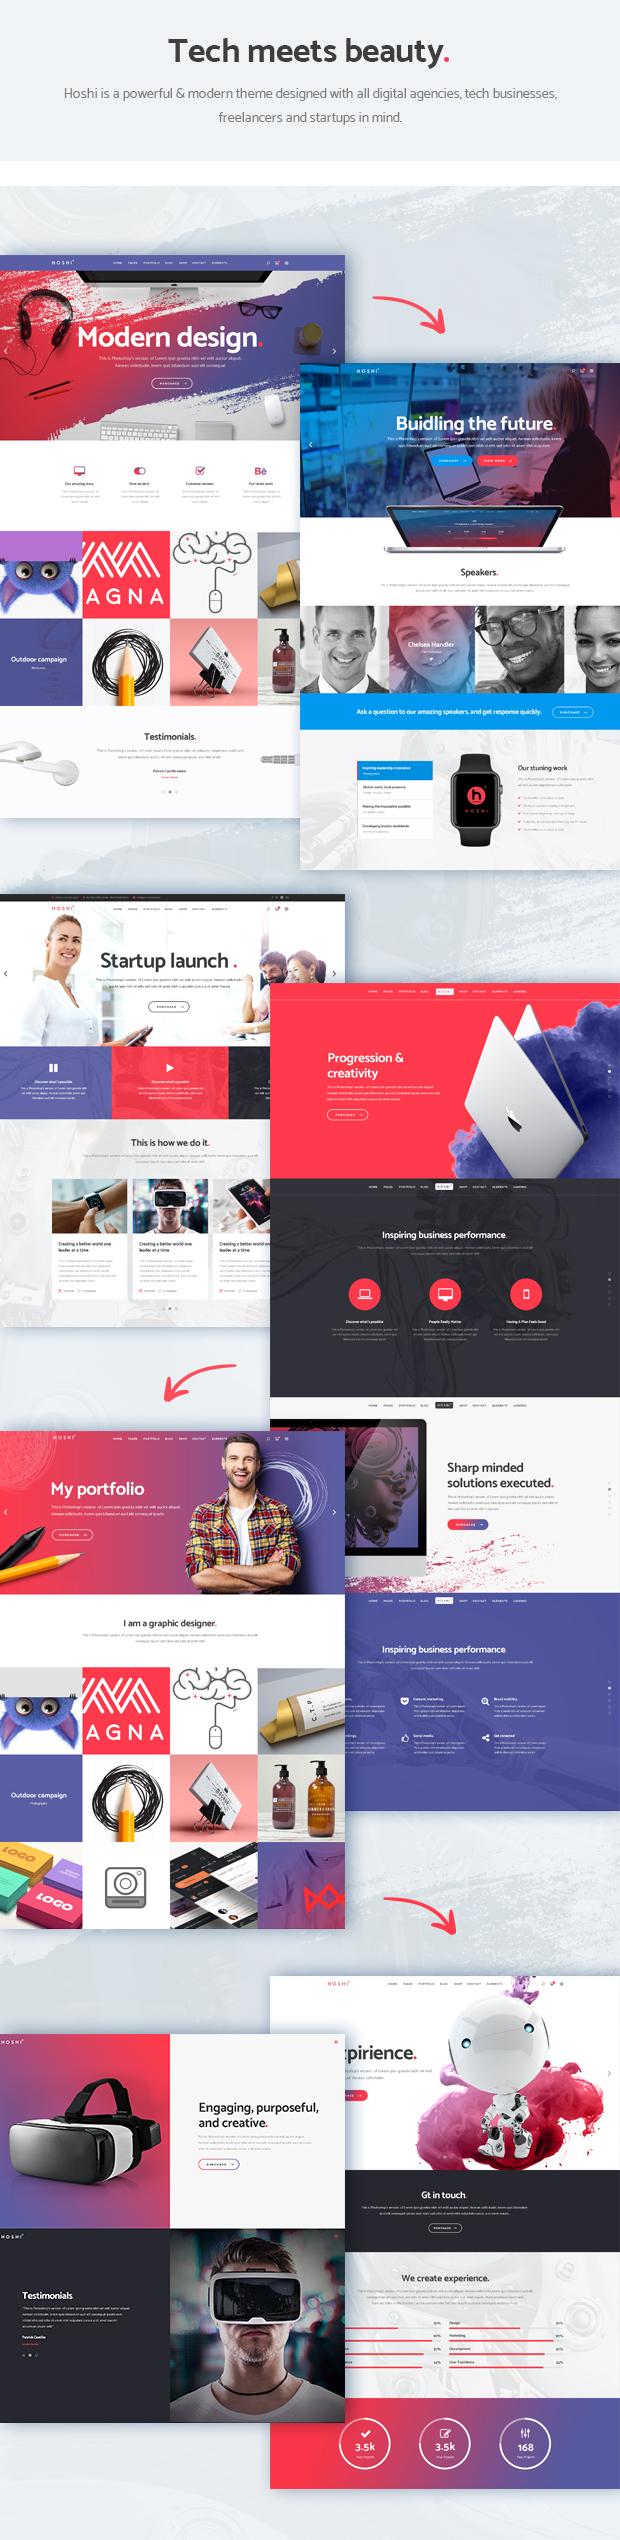 Hoshi - Digital Agency Theme - 1